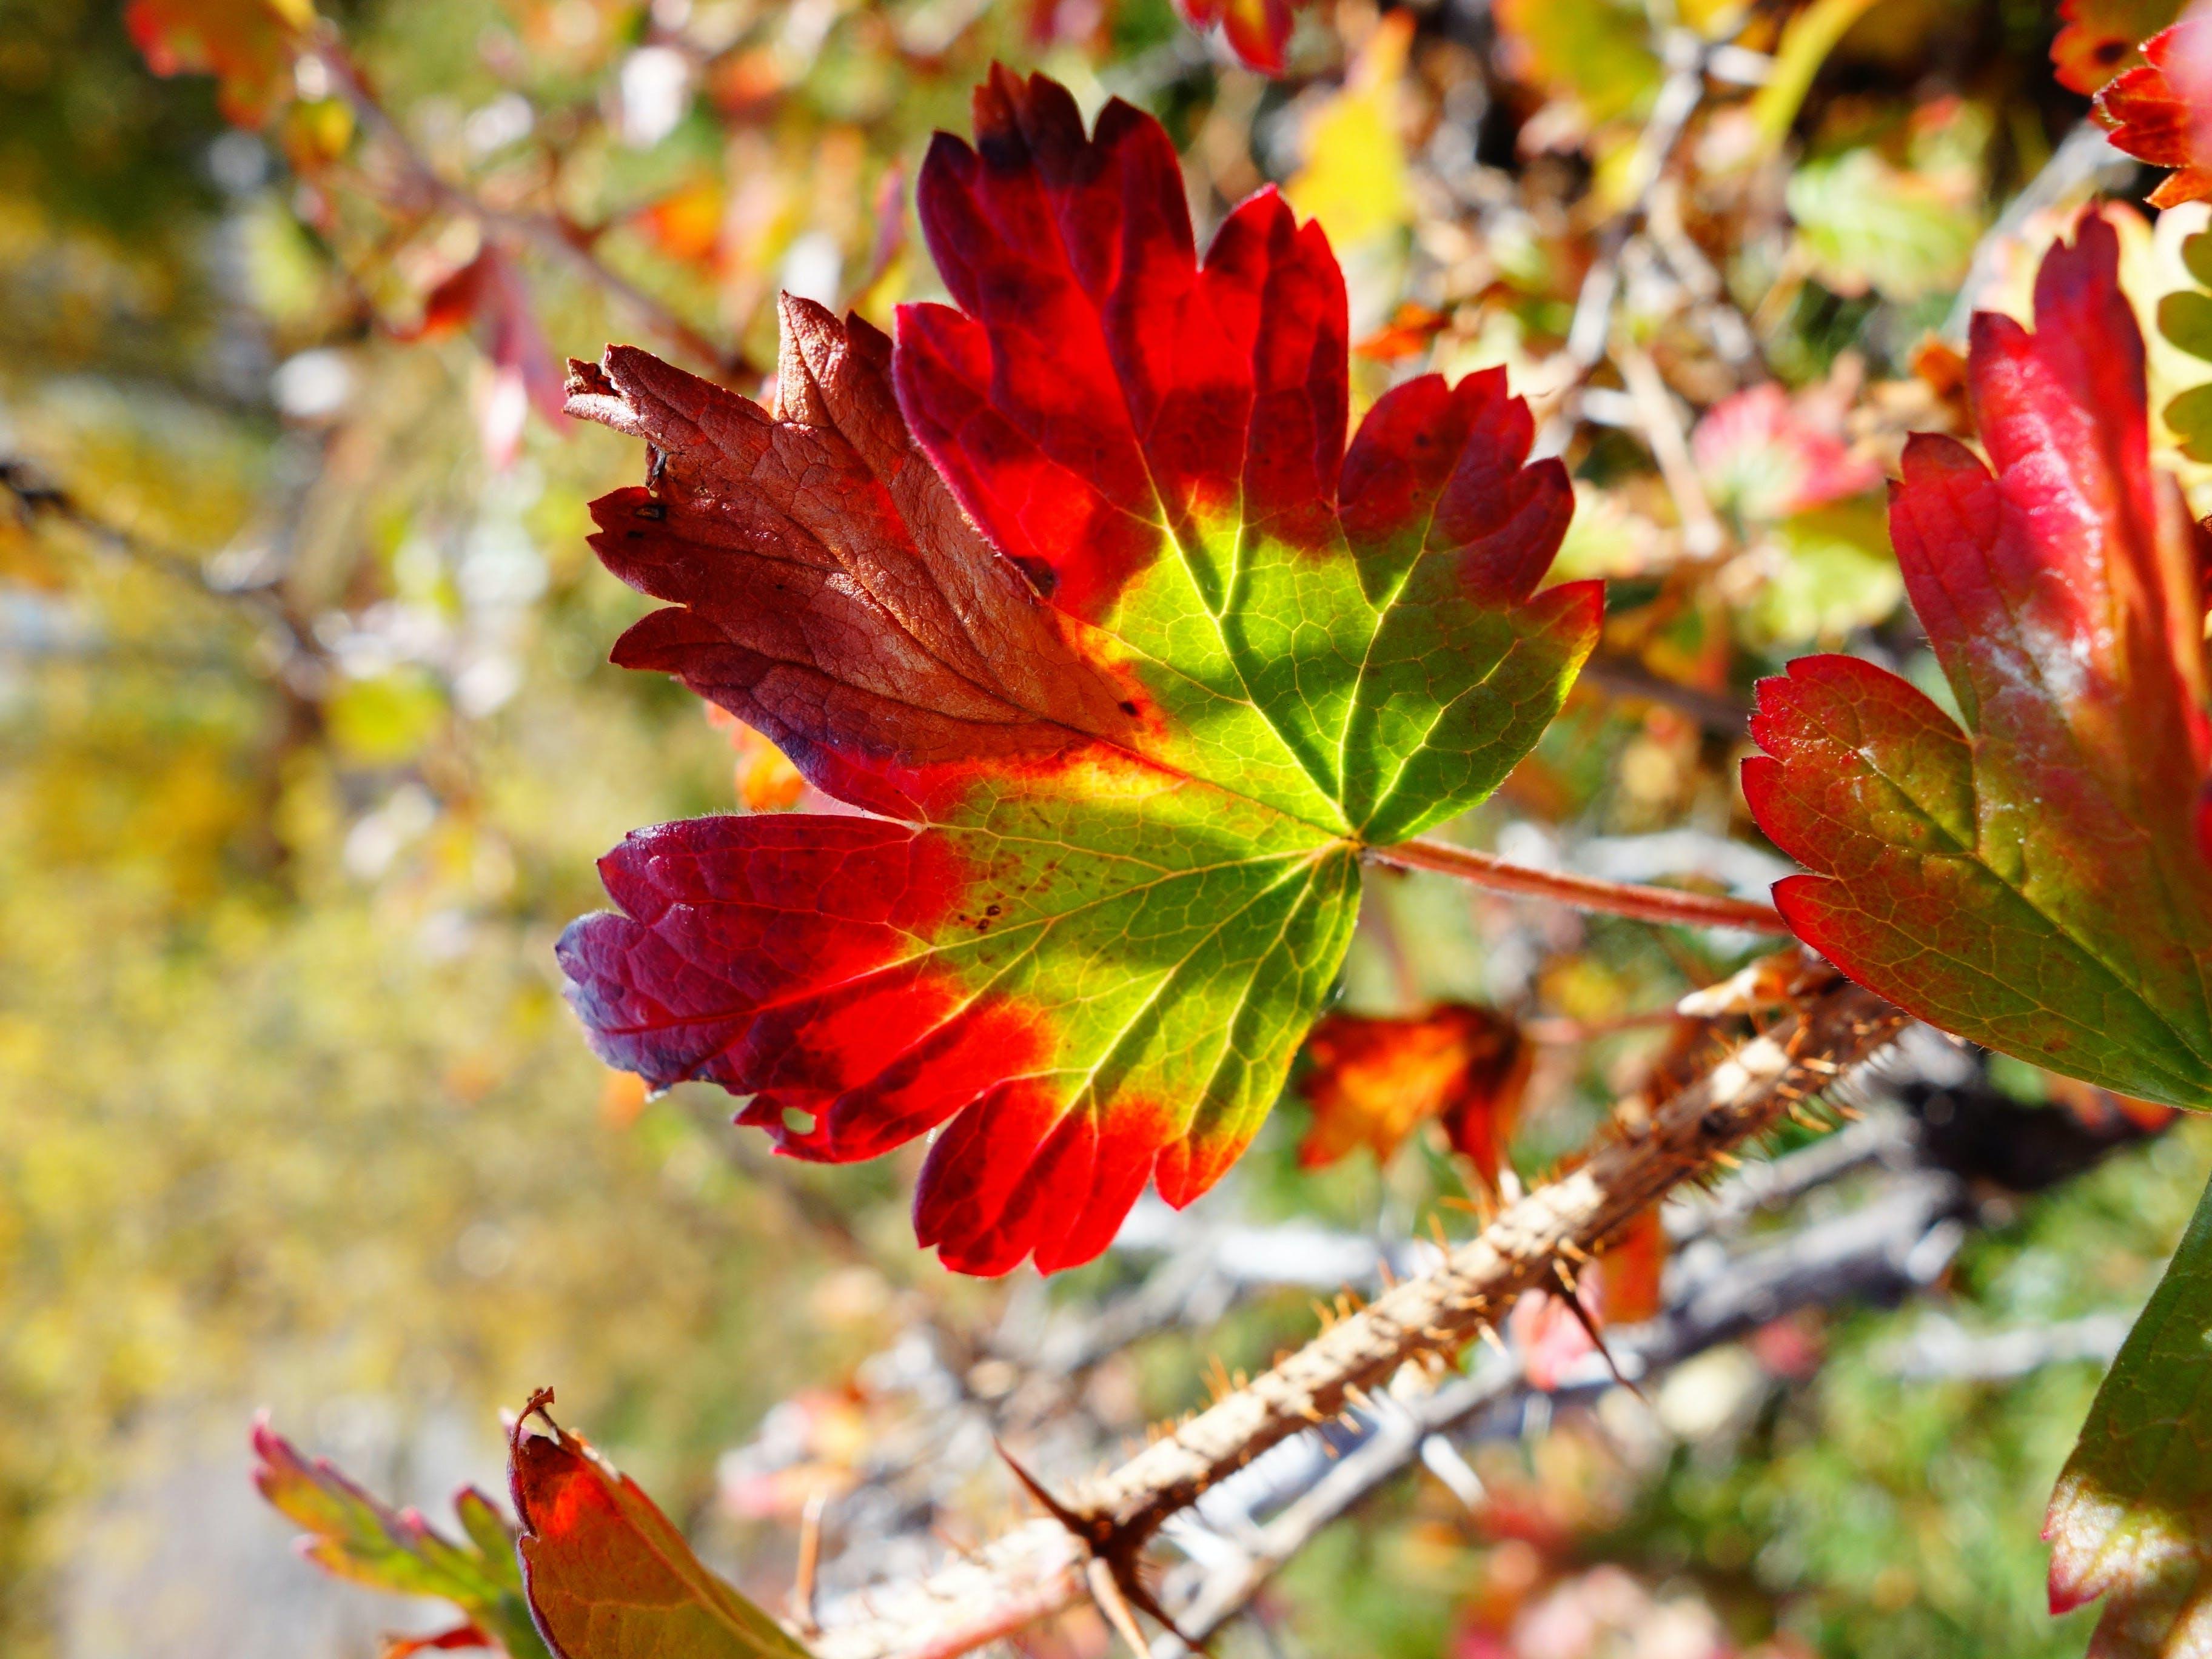 Kostenloses Stock Foto zu ahorn, ahornblatt, ahornblätter, farben